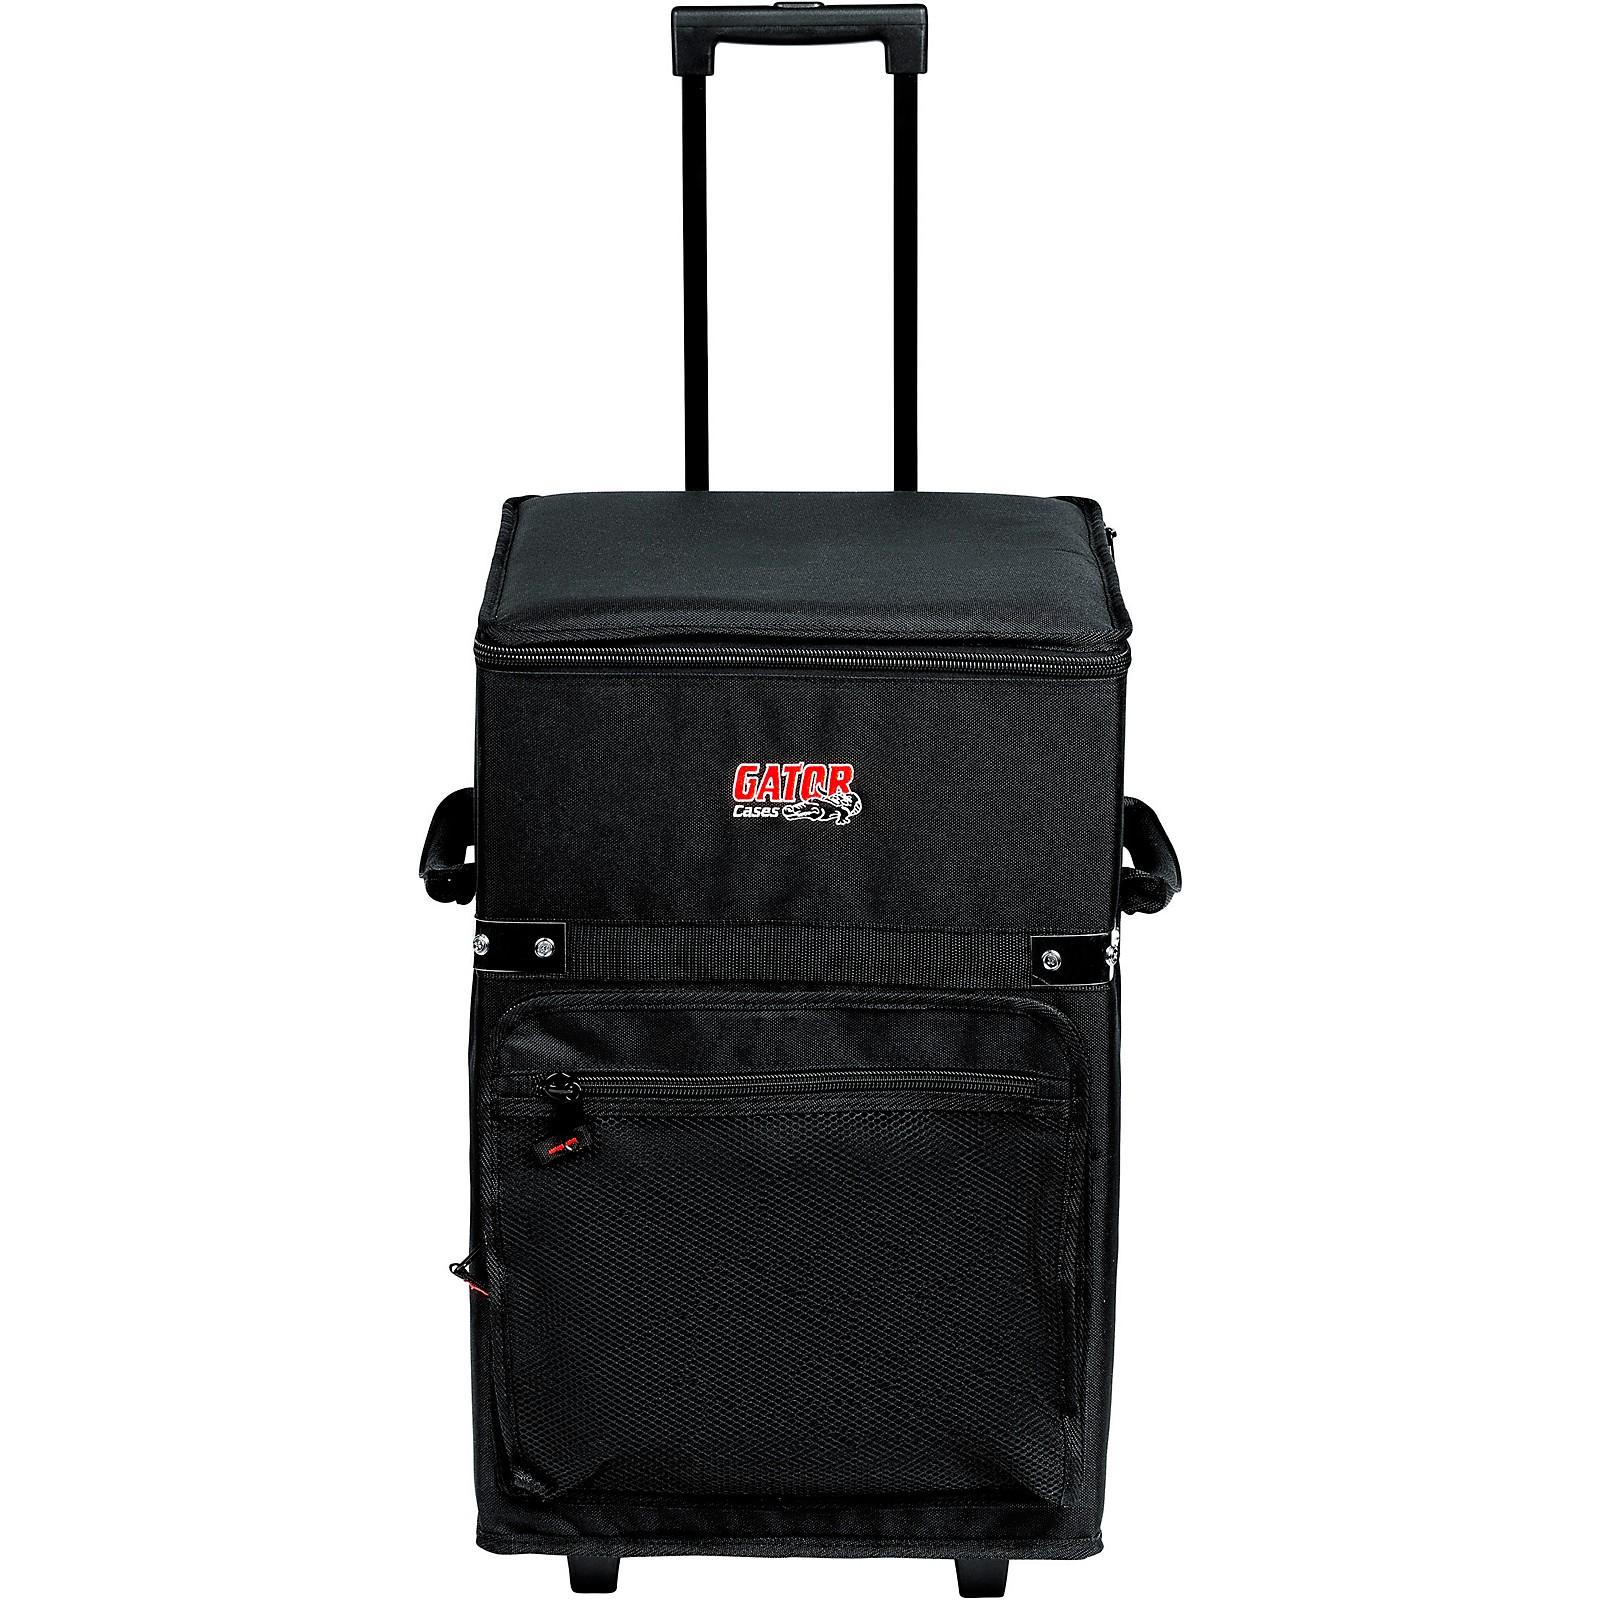 Open Box Gator GX-20 Utility Case